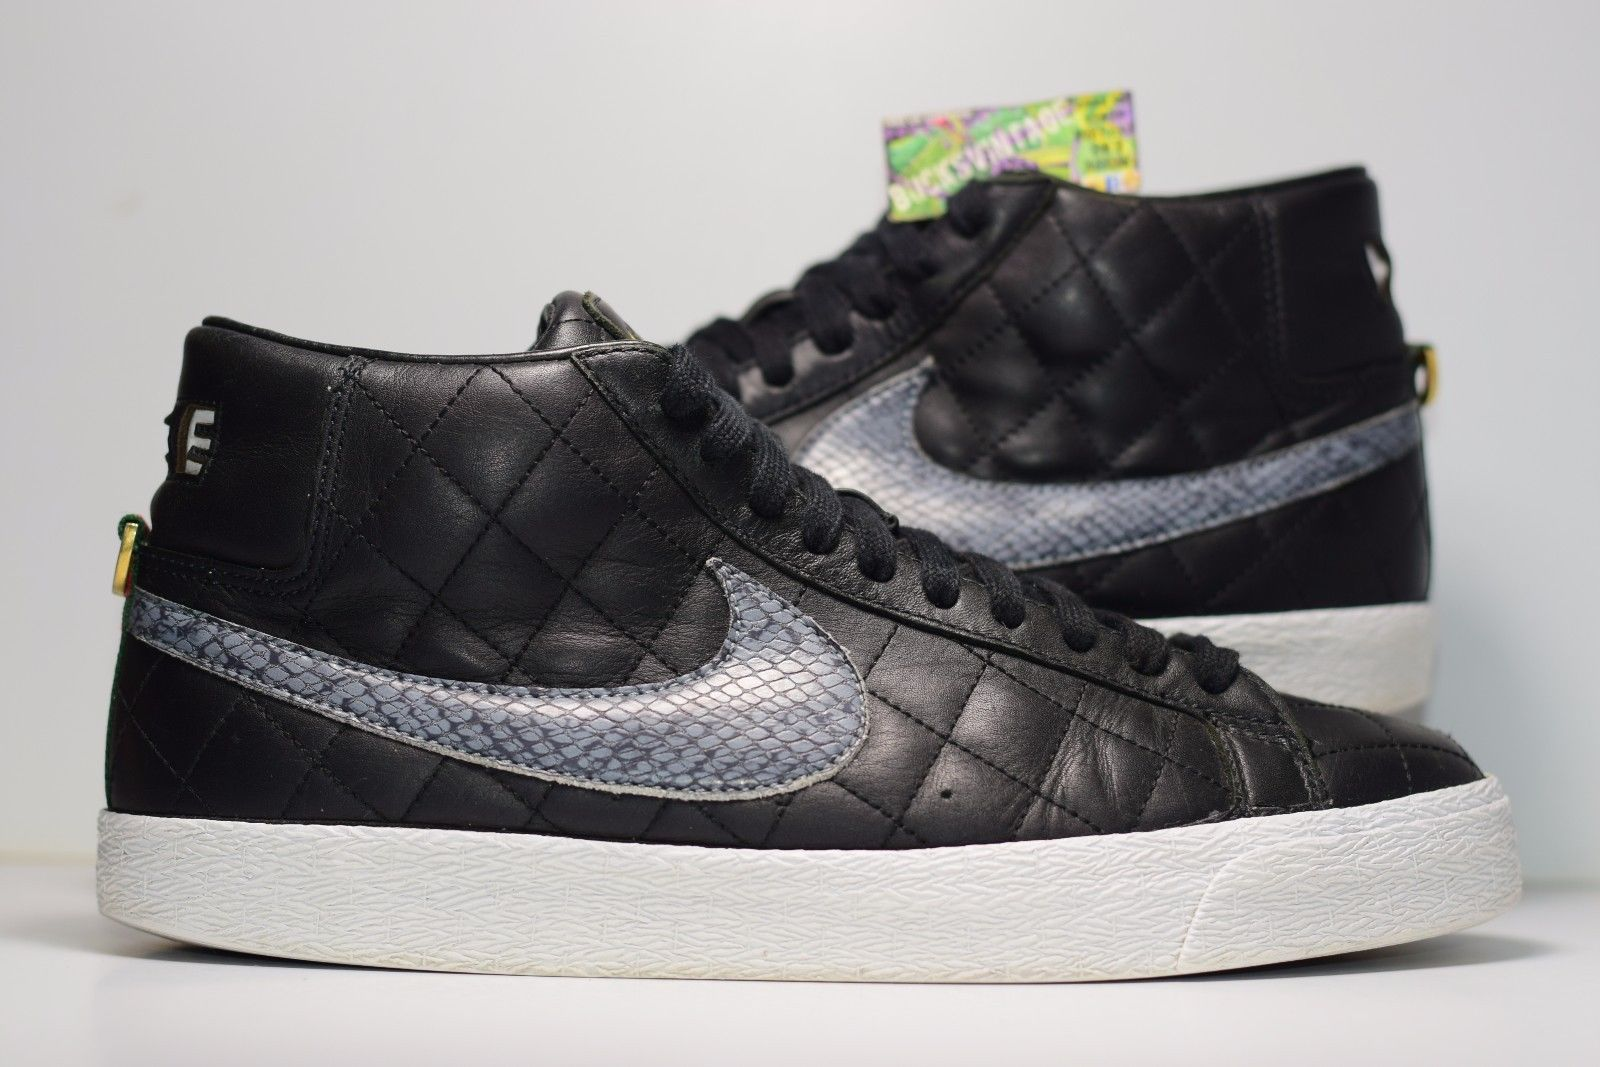 quality design fcbdb 77b30 Size 9.5   2006 Nike SB Blazer SUPREME Black Black 313962-001 - Thumbnail  ...